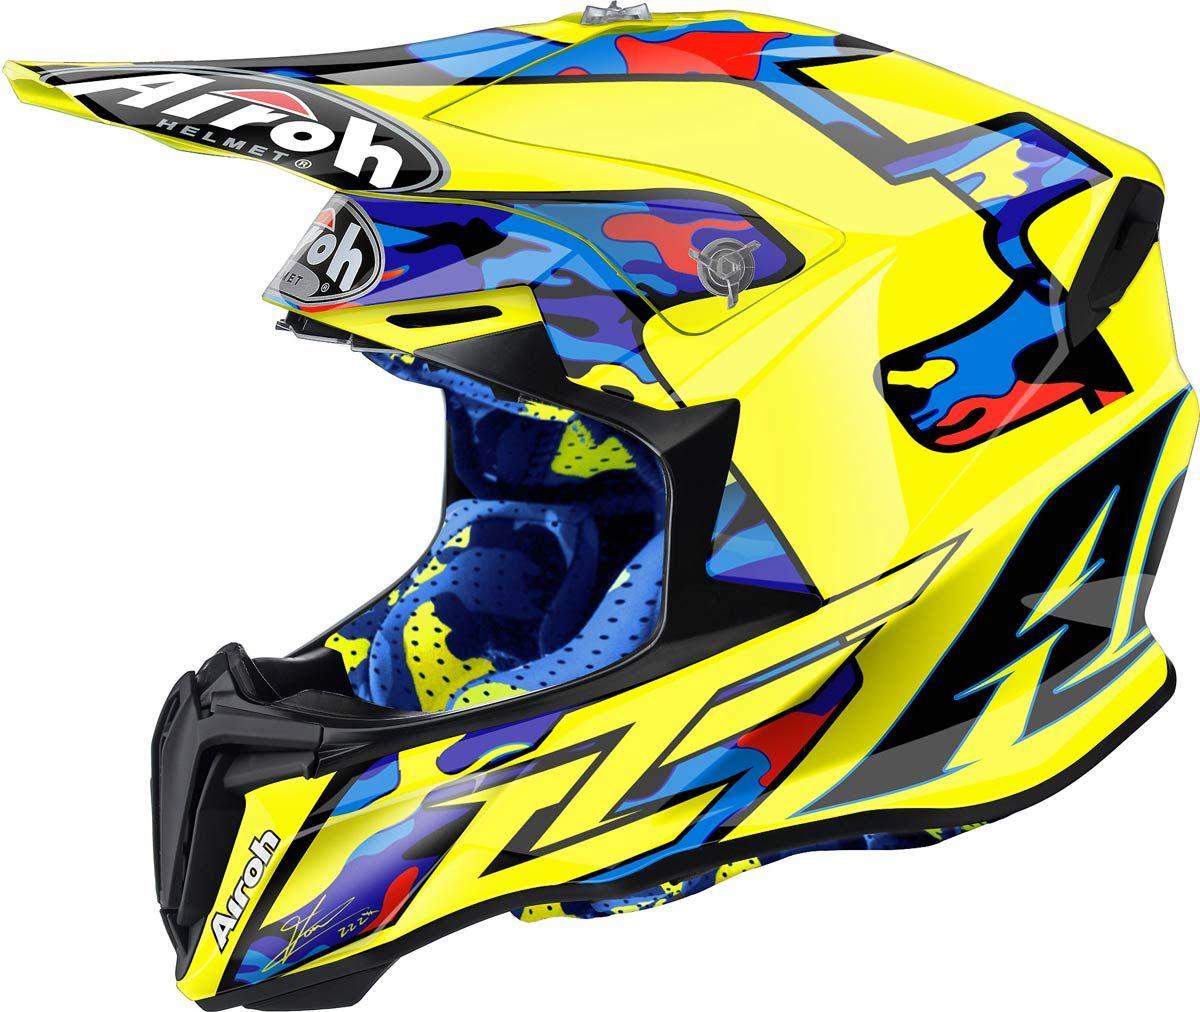 Airoh Twist Un Cross Italien à Moins De 200 Helmets Dirt Bike